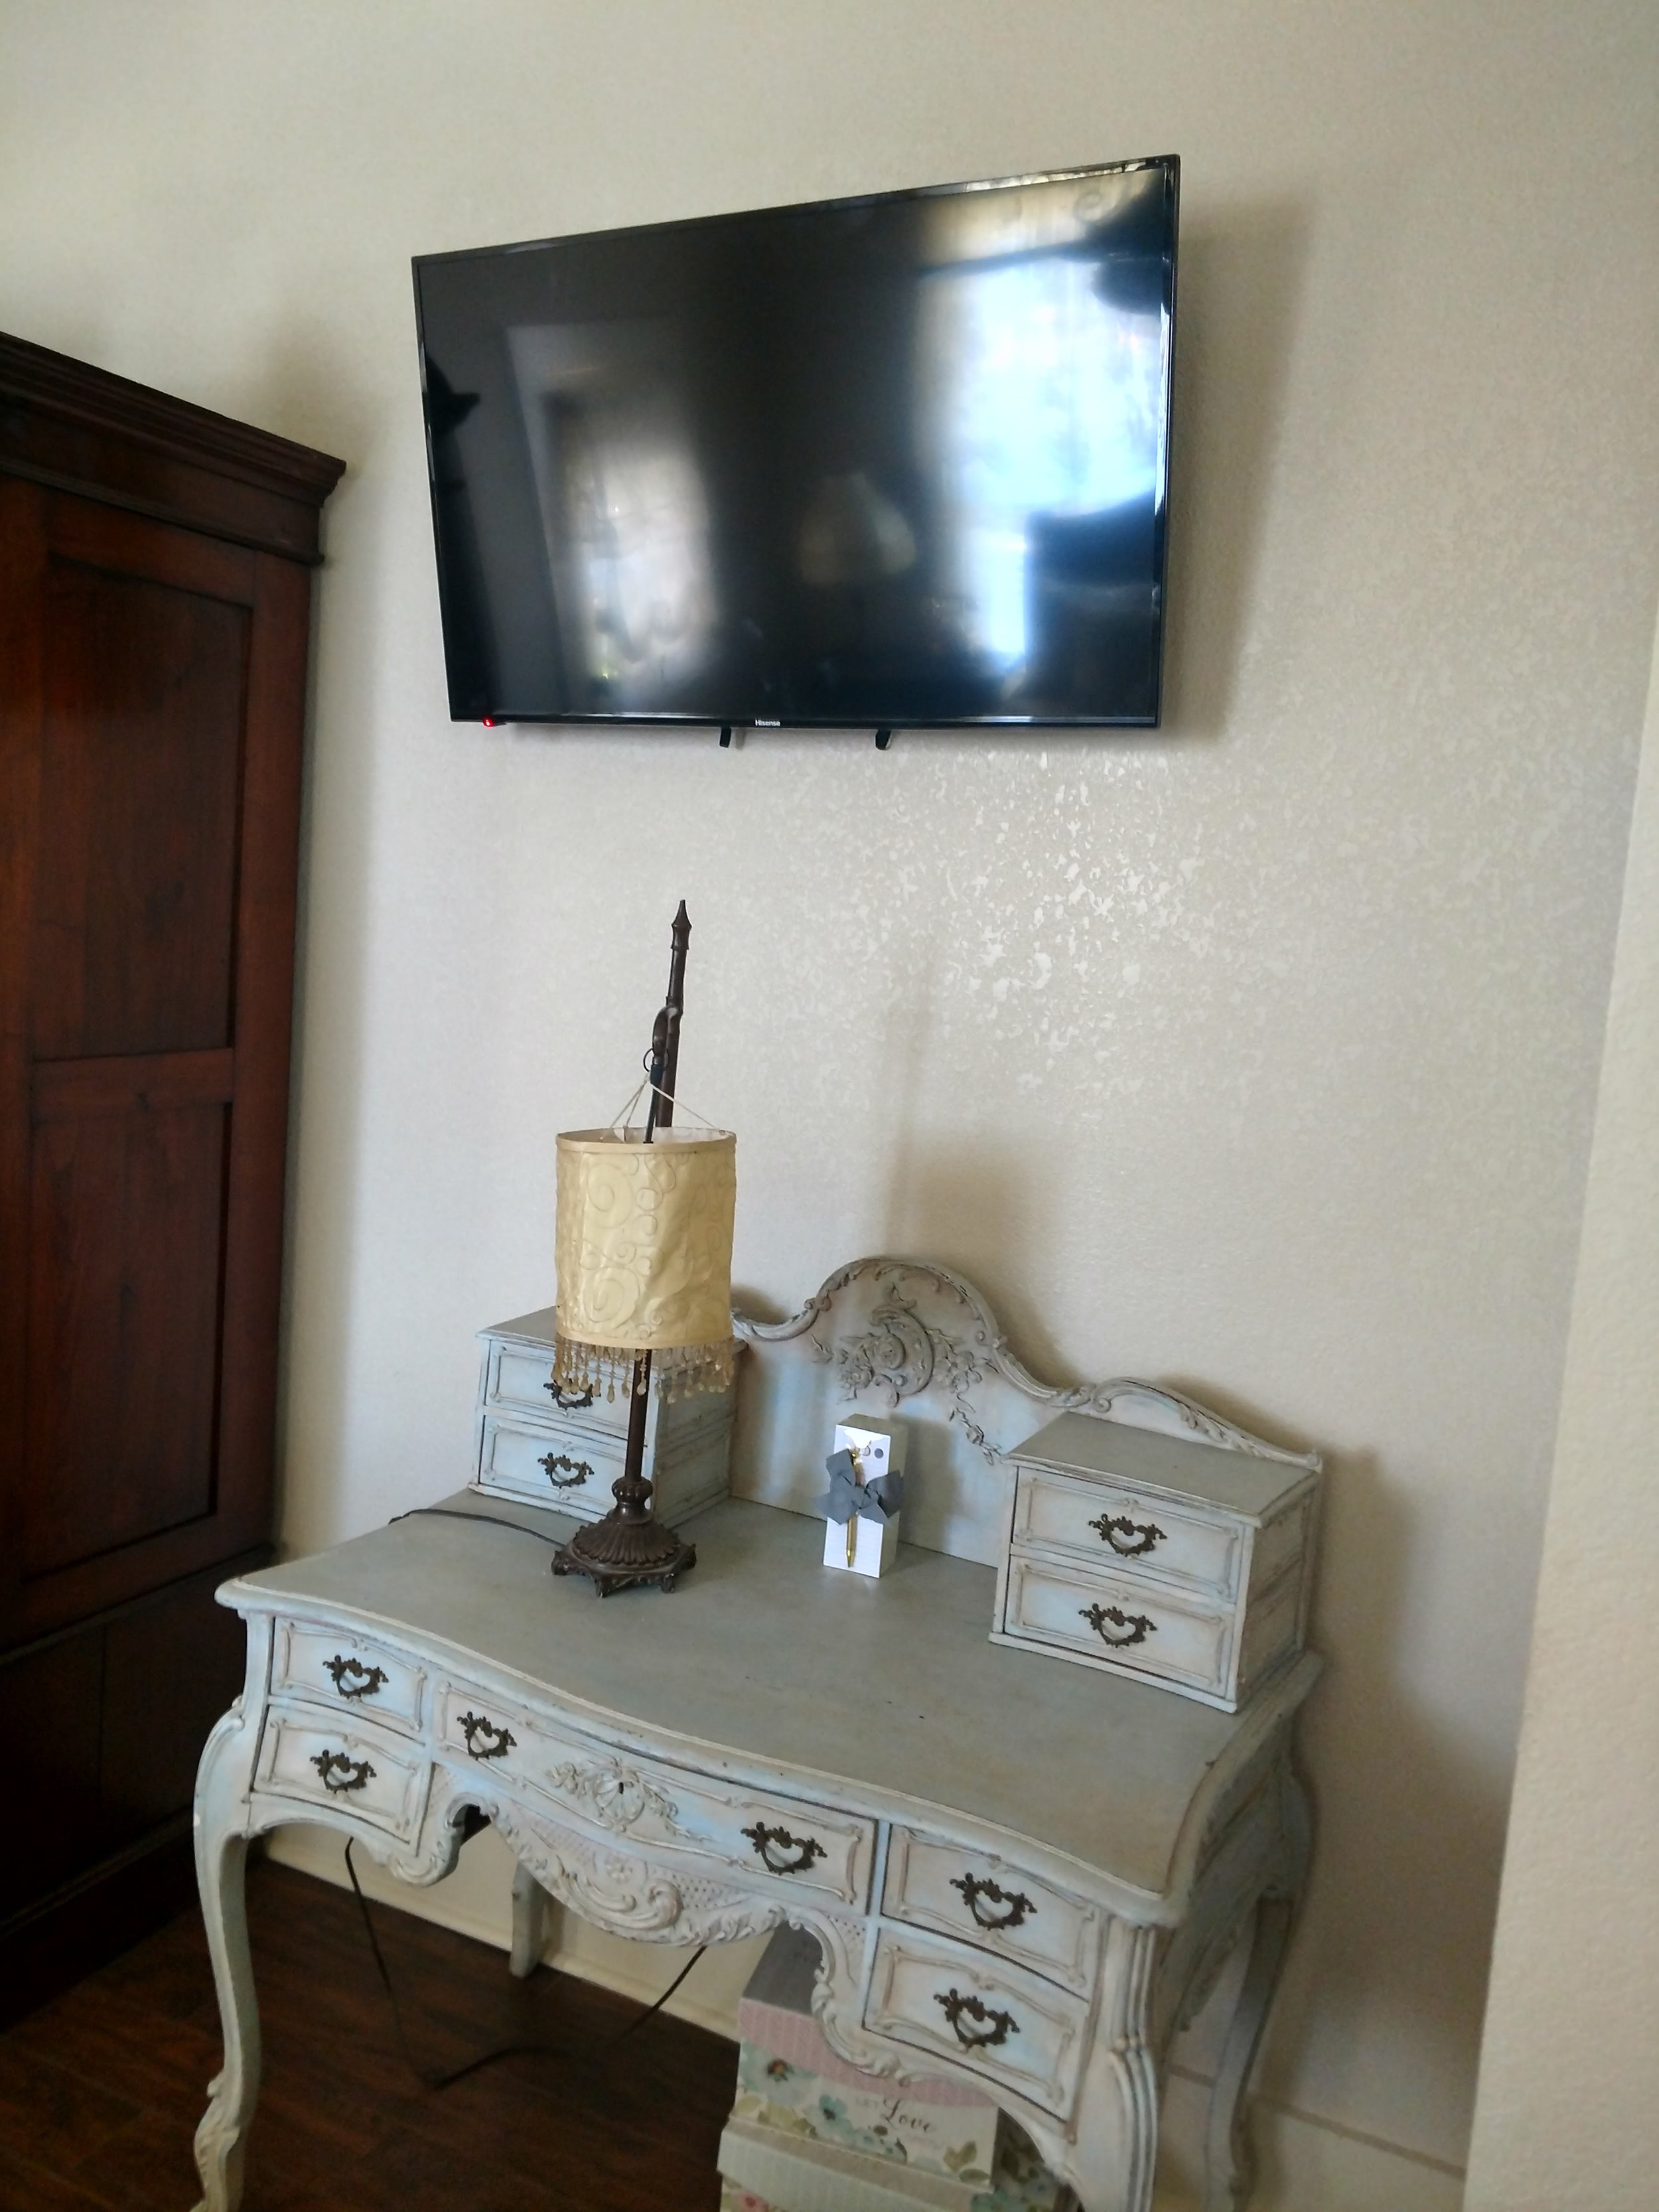 Big House_desk and tv King alex room.jpg